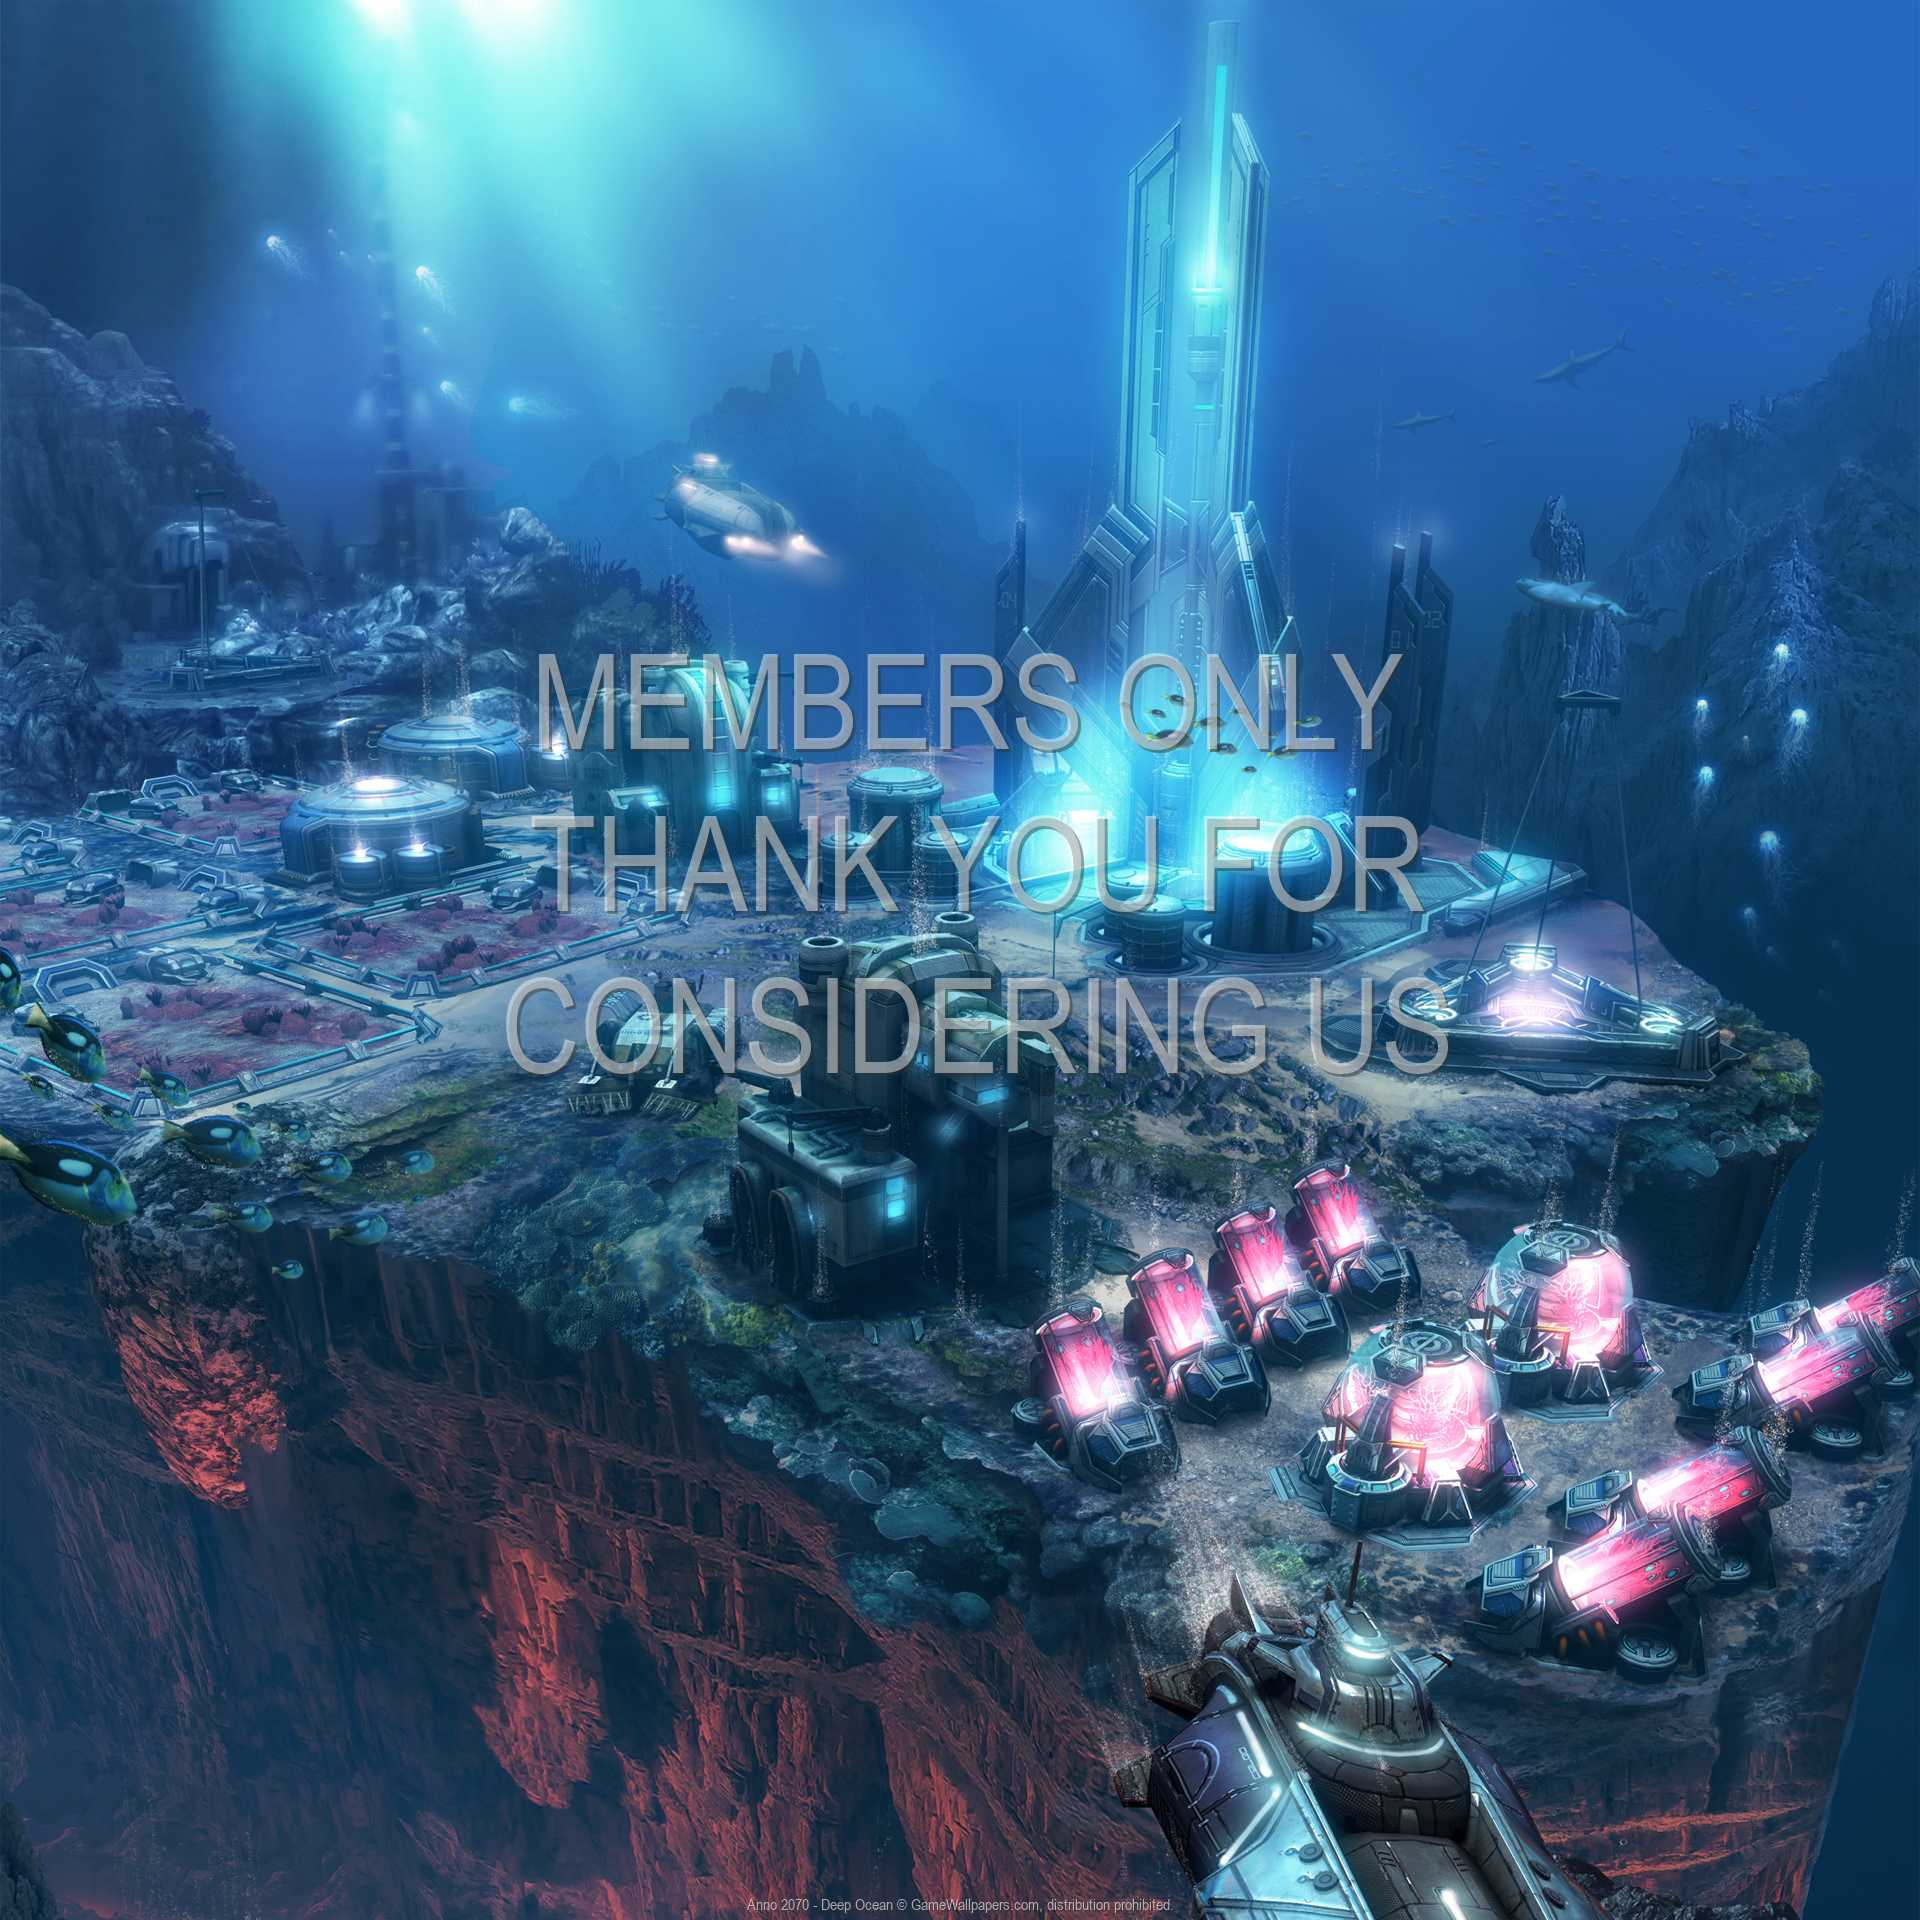 Anno 2070 - Deep Ocean 1080p Horizontal Handy Hintergrundbild 02